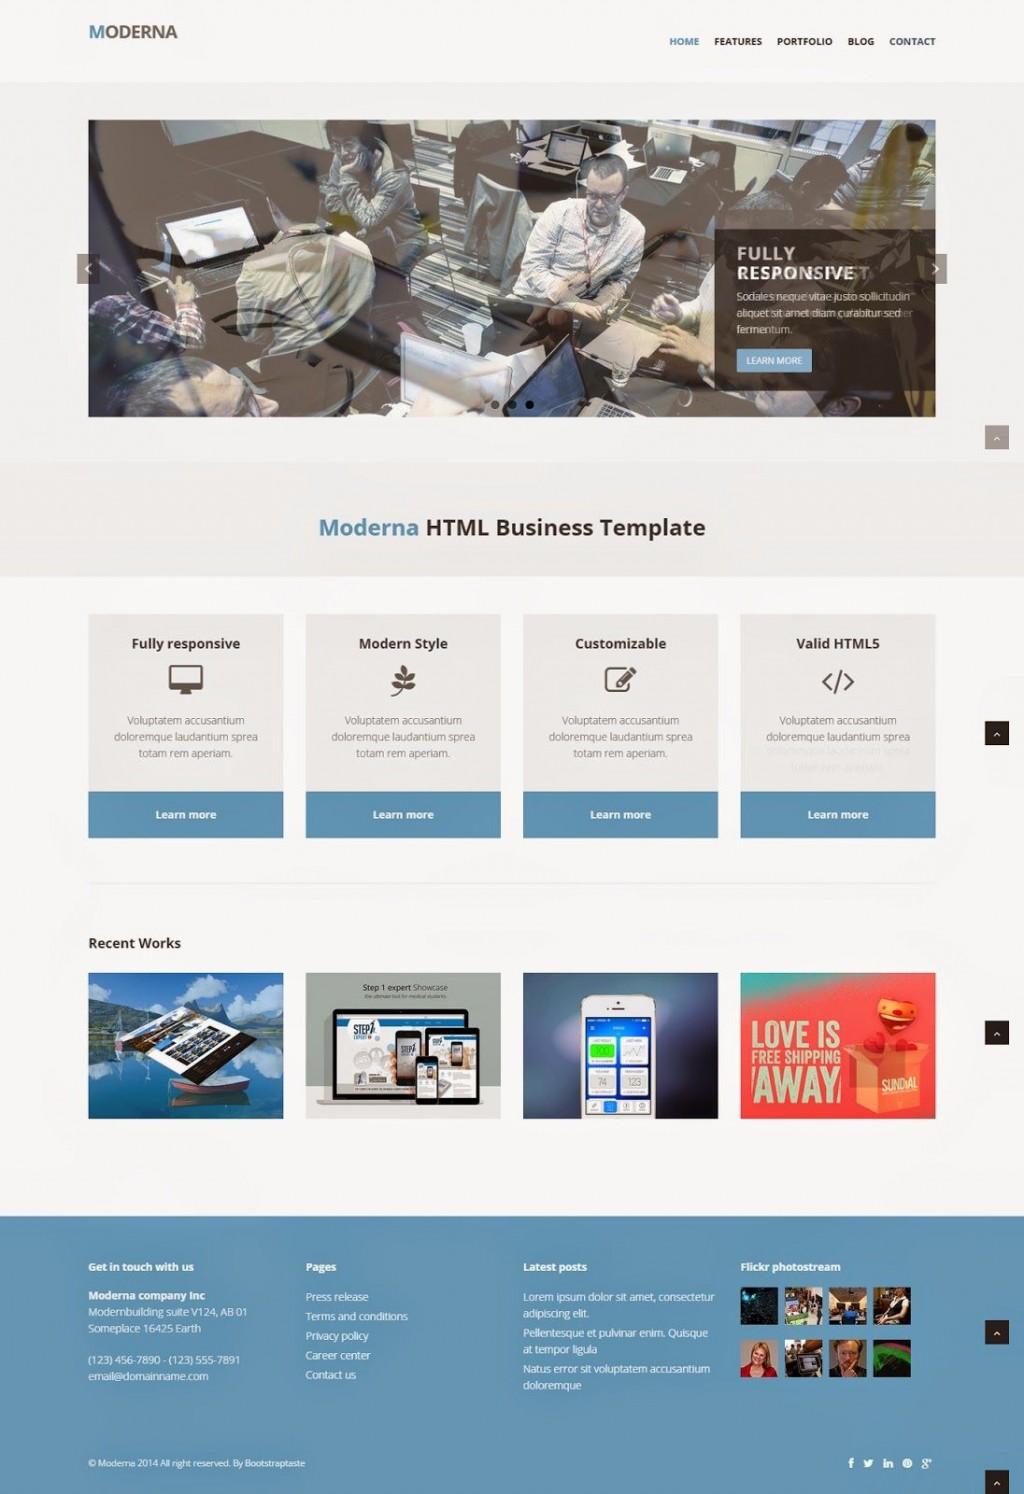 008 Fascinating Web Page Design Template In Asp Net Sample  Asp.netLarge